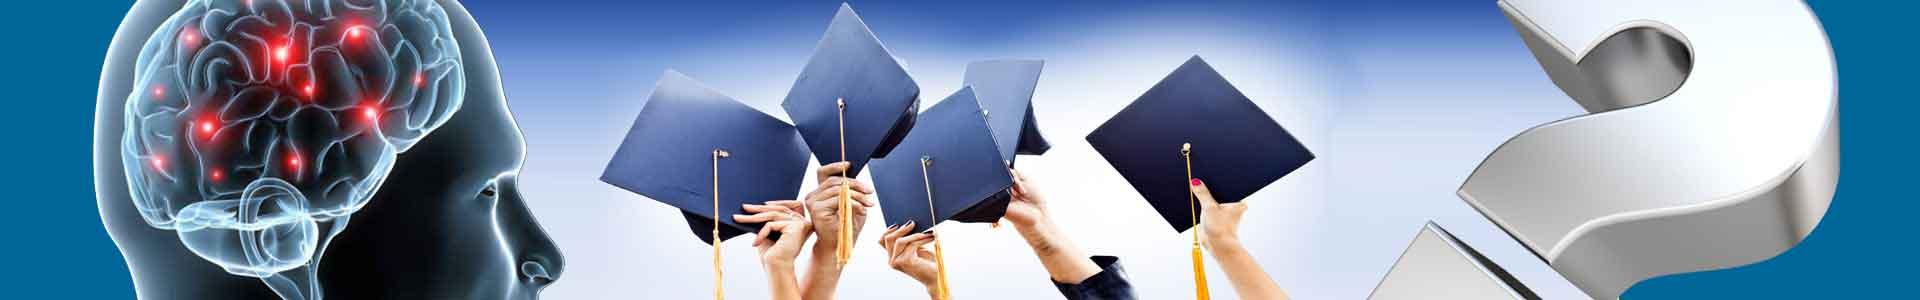 Dealer Leads University